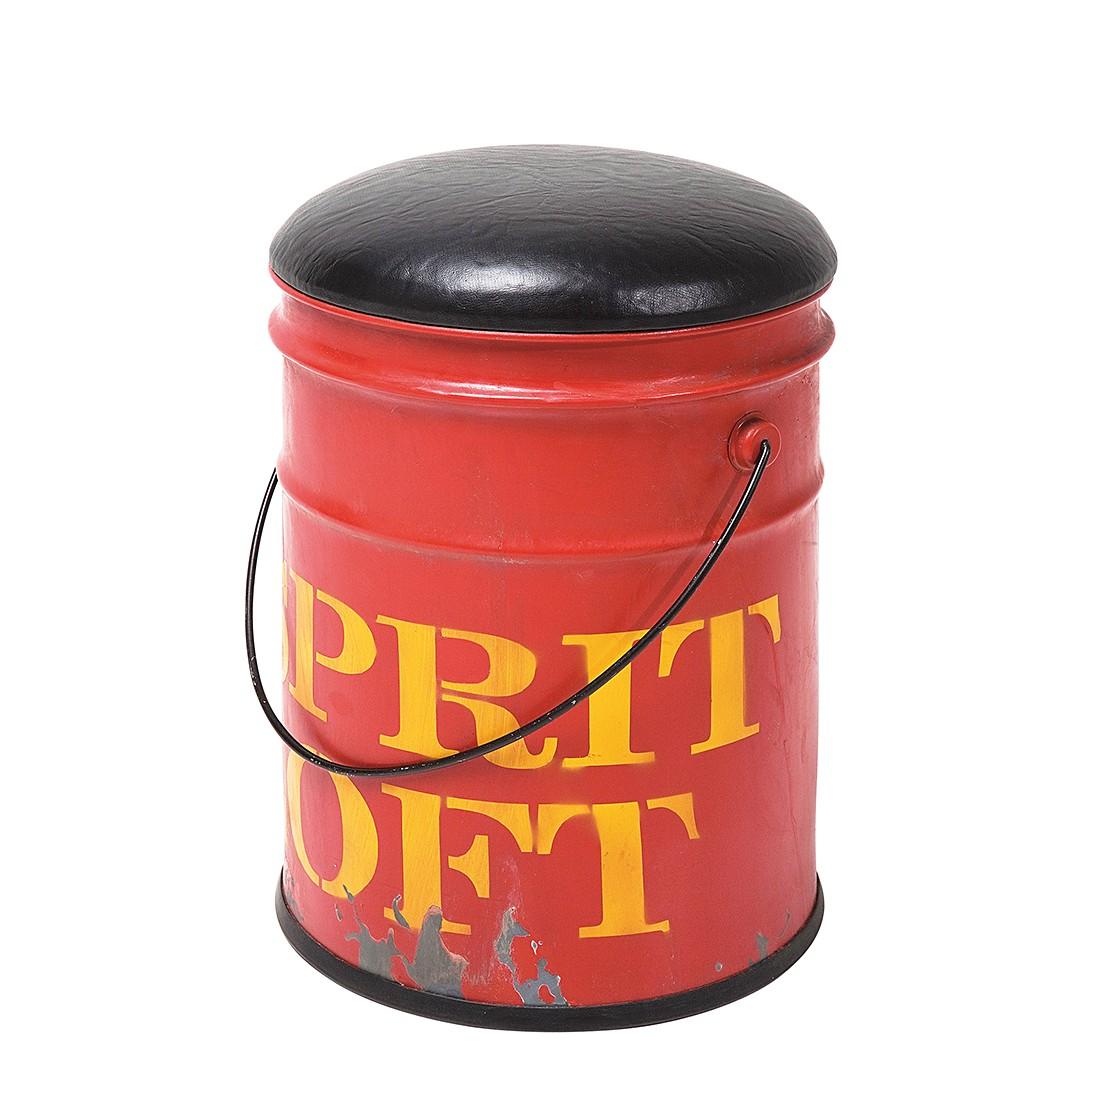 Hocker Bucket – Rot, Kare Design günstig bestellen